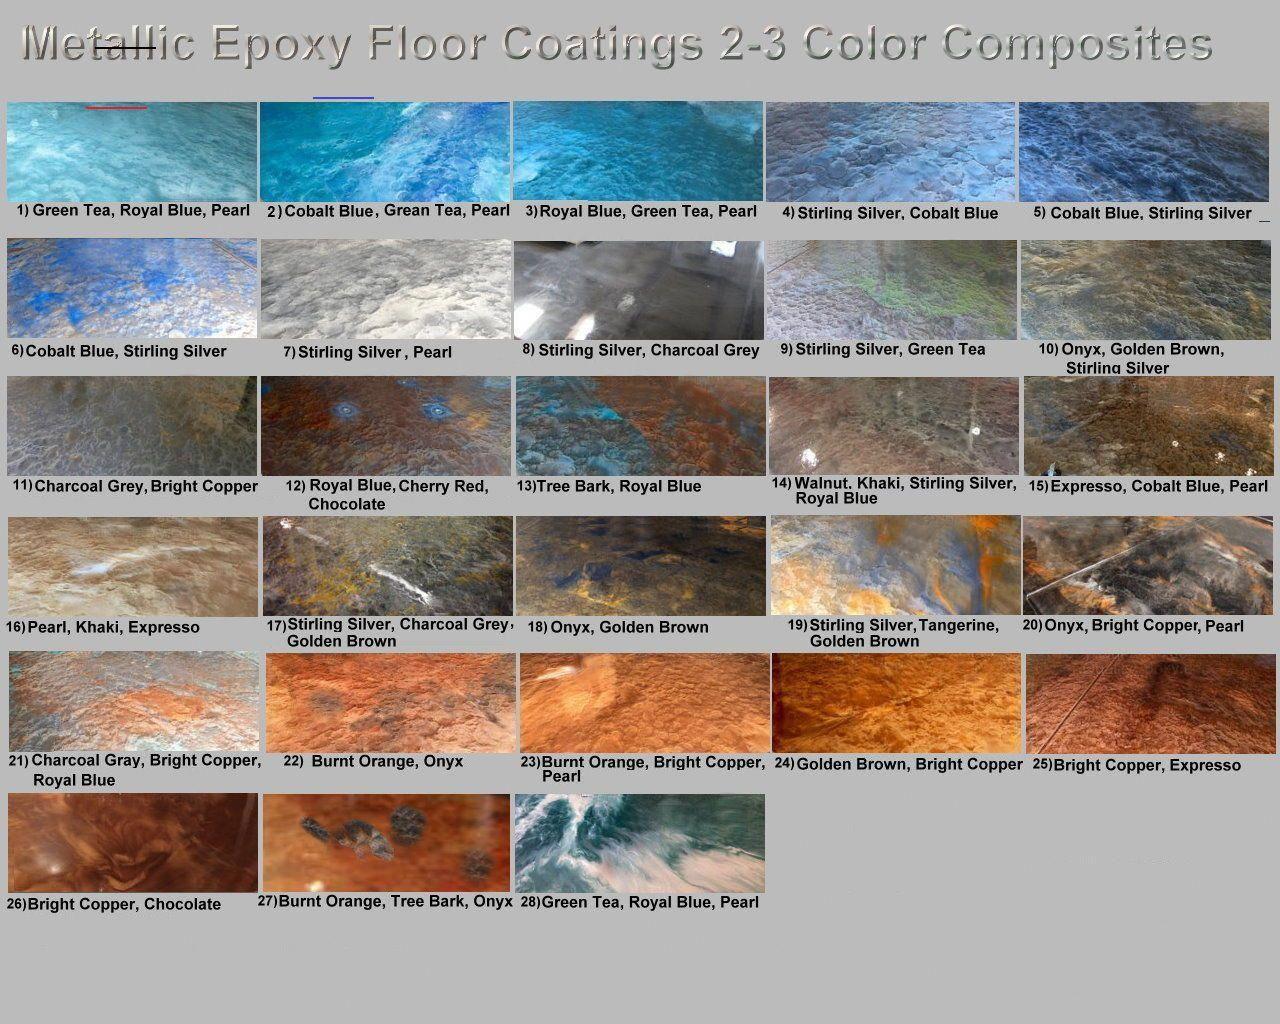 Metallic Mica Epoxy Concrete Garage Floor Countertop Paint Coating Pigment Kit Epoxycountertop In 2020 Epoxy Floor Concrete Epoxy Metallic Epoxy Floor